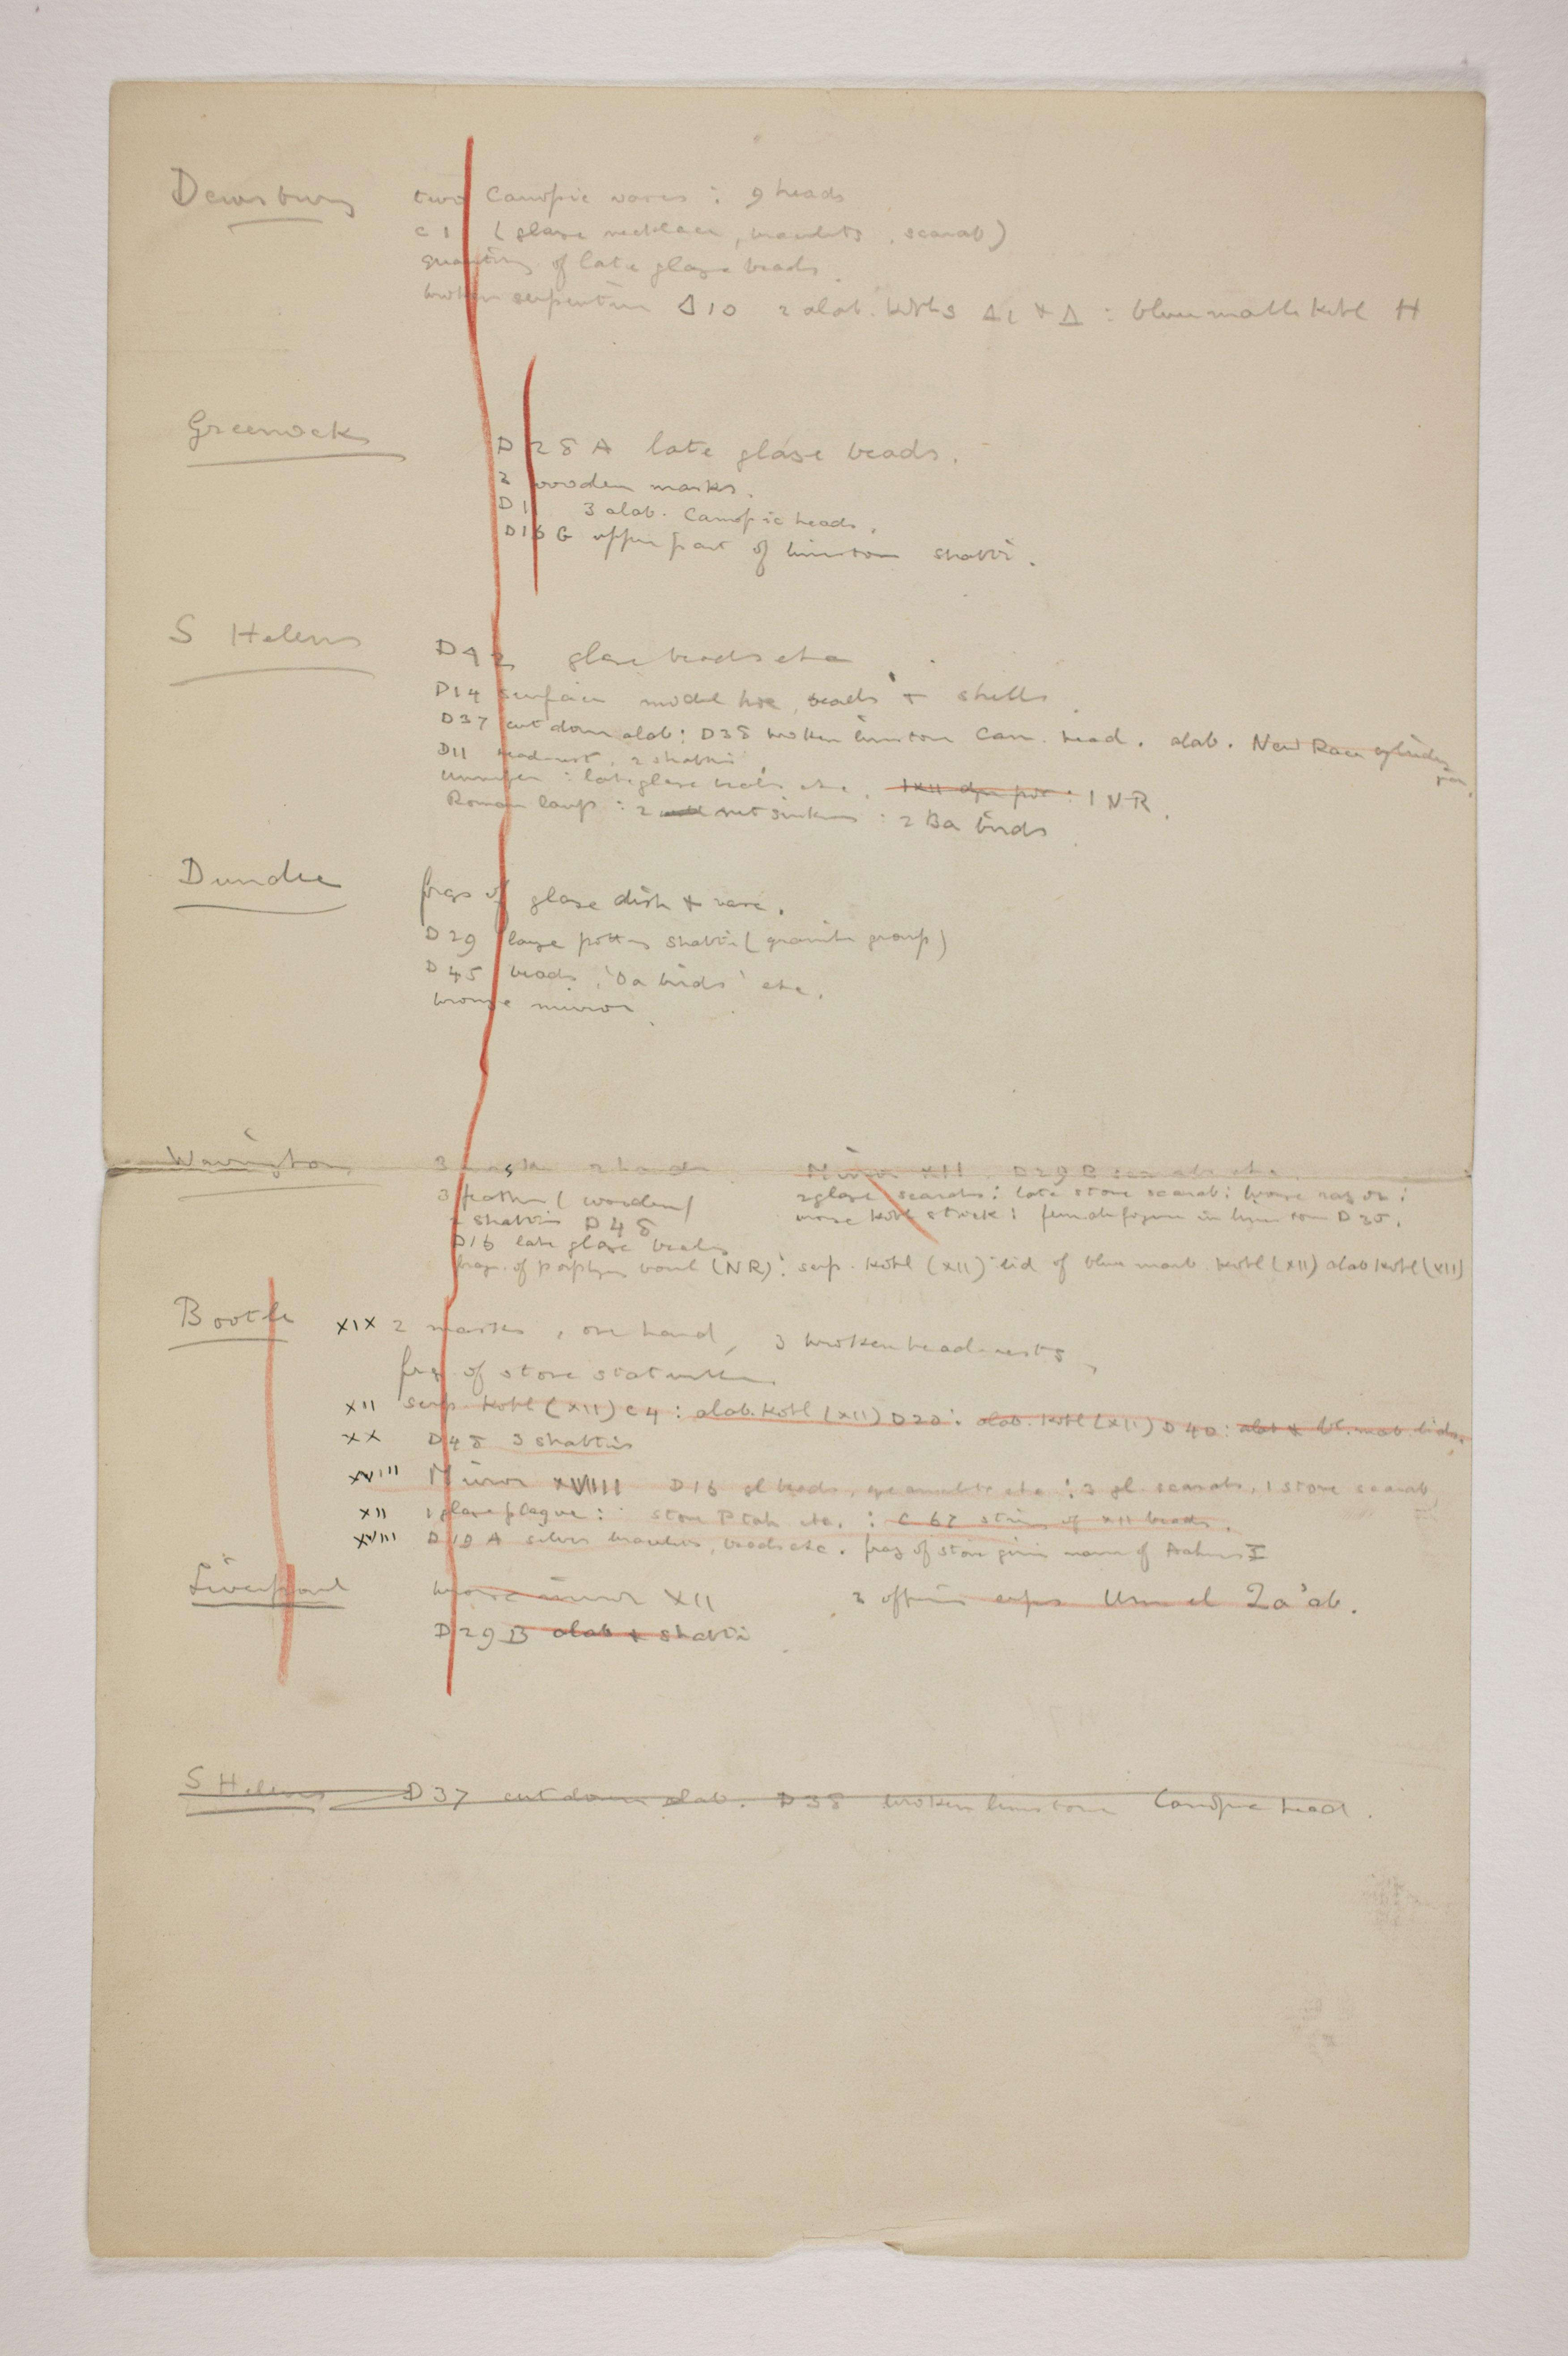 1899-1900 Abydos Multiple institution list PMA/WFP1/D/8/11.2